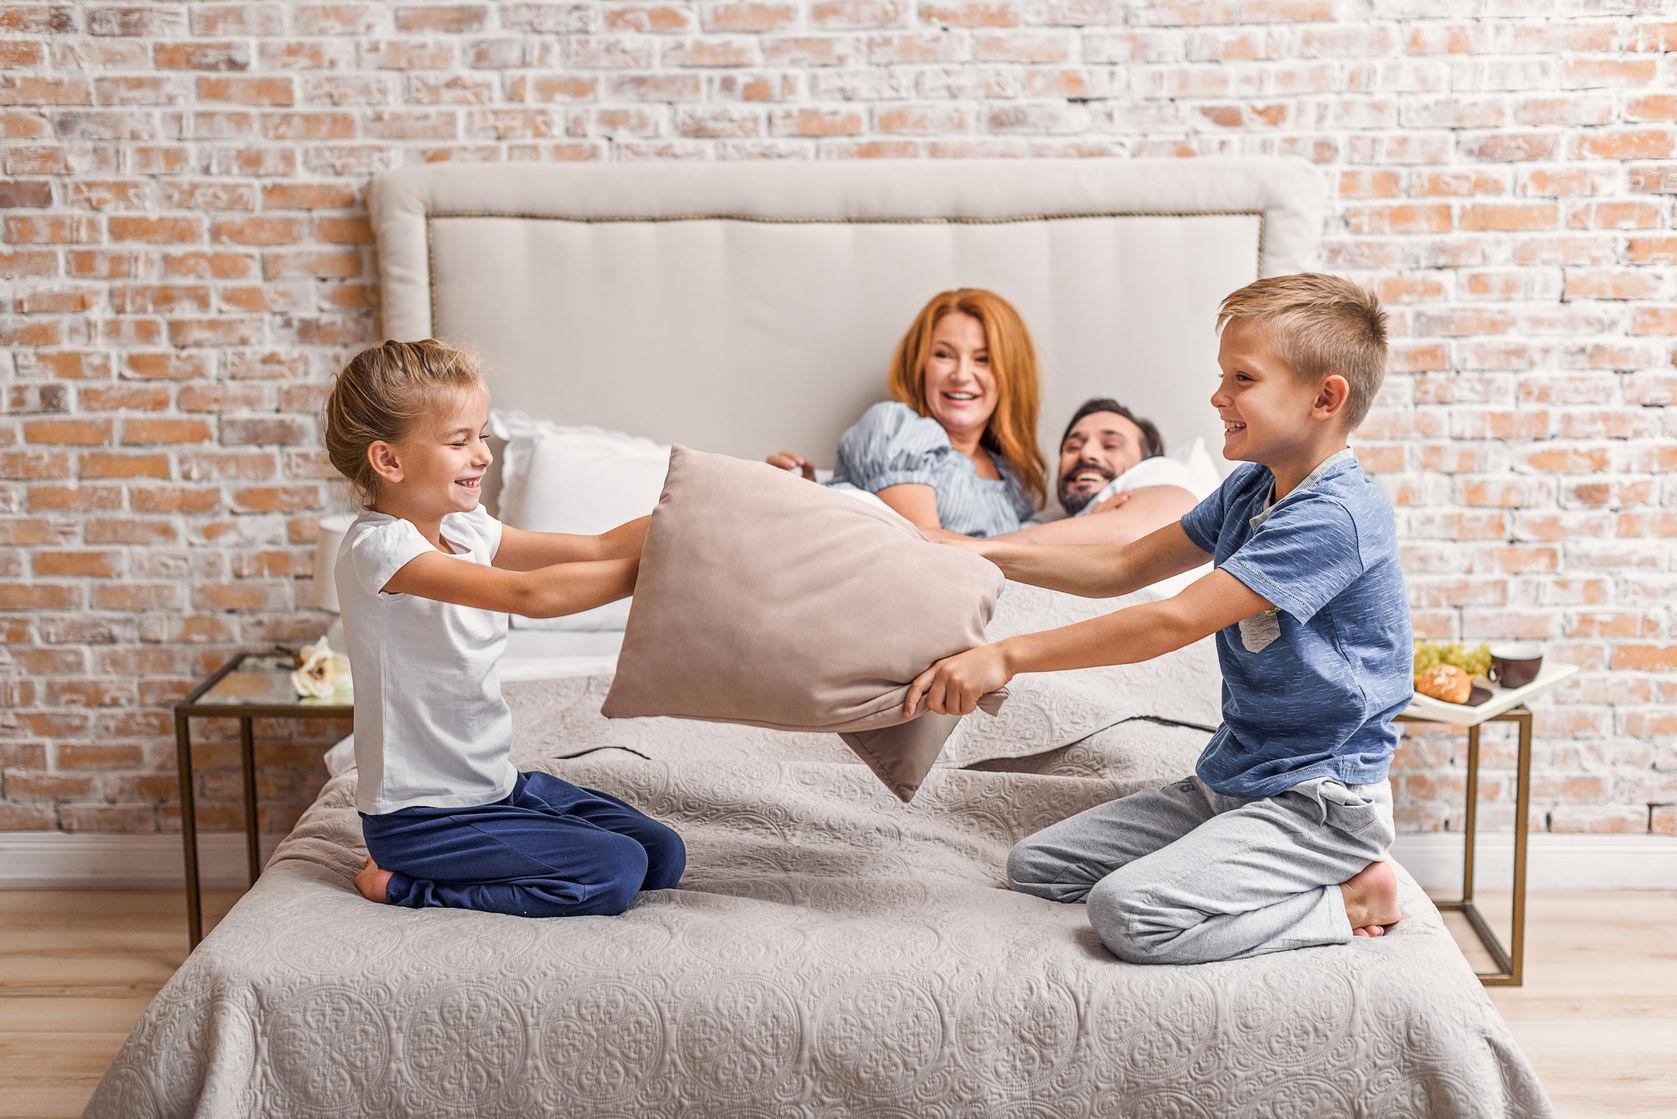 Развивающие коврики для детей от 0 до 18 месяцев фото цена